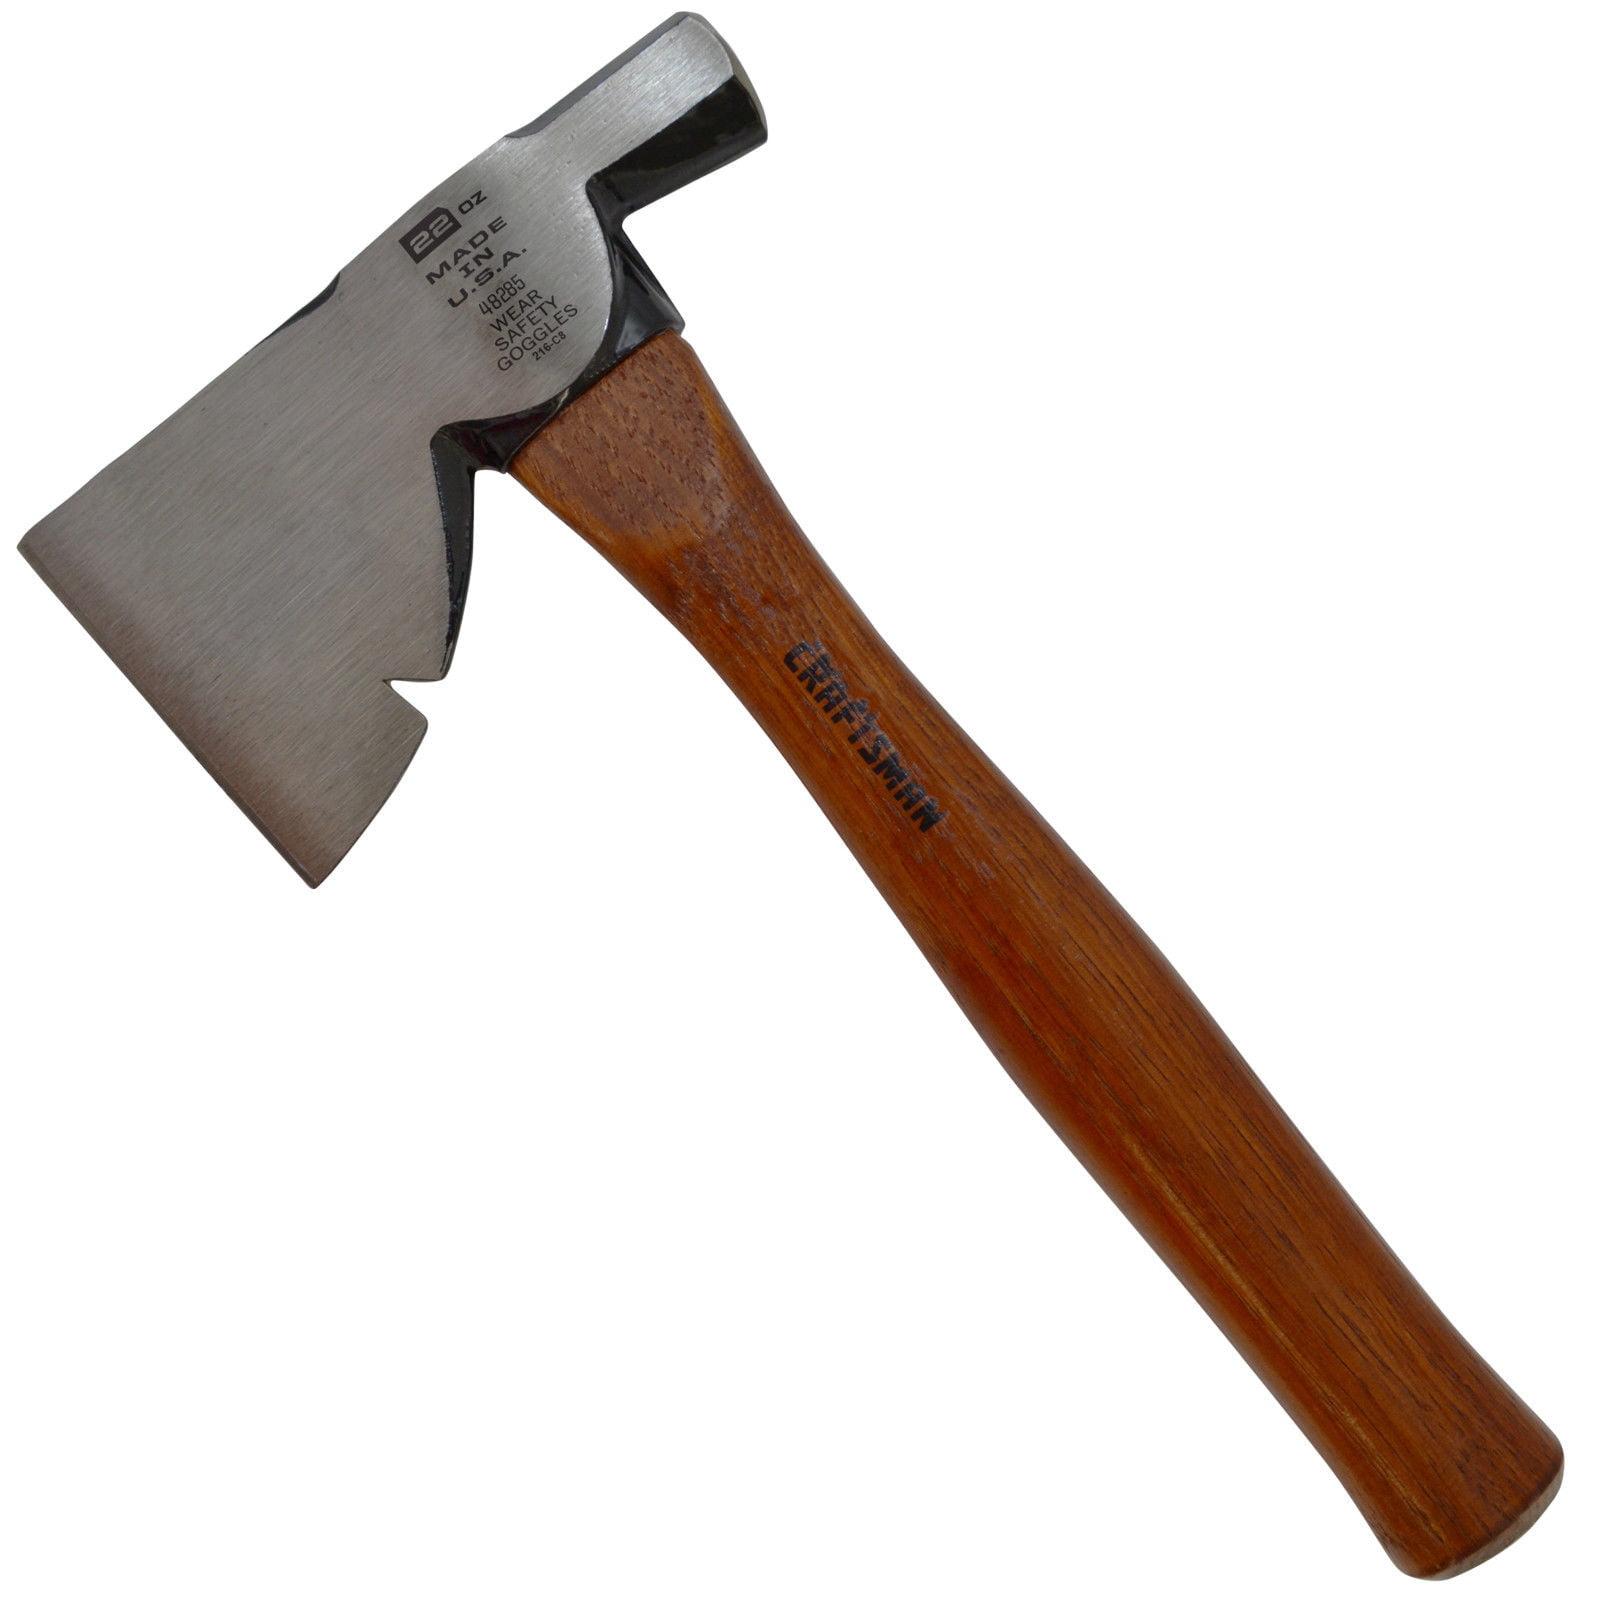 Craftsman Half Hatchet 22 oz. Head Axe 3-1 2 in. Blade Hickory Handle Lawn Garden Hand Tool 48285 by